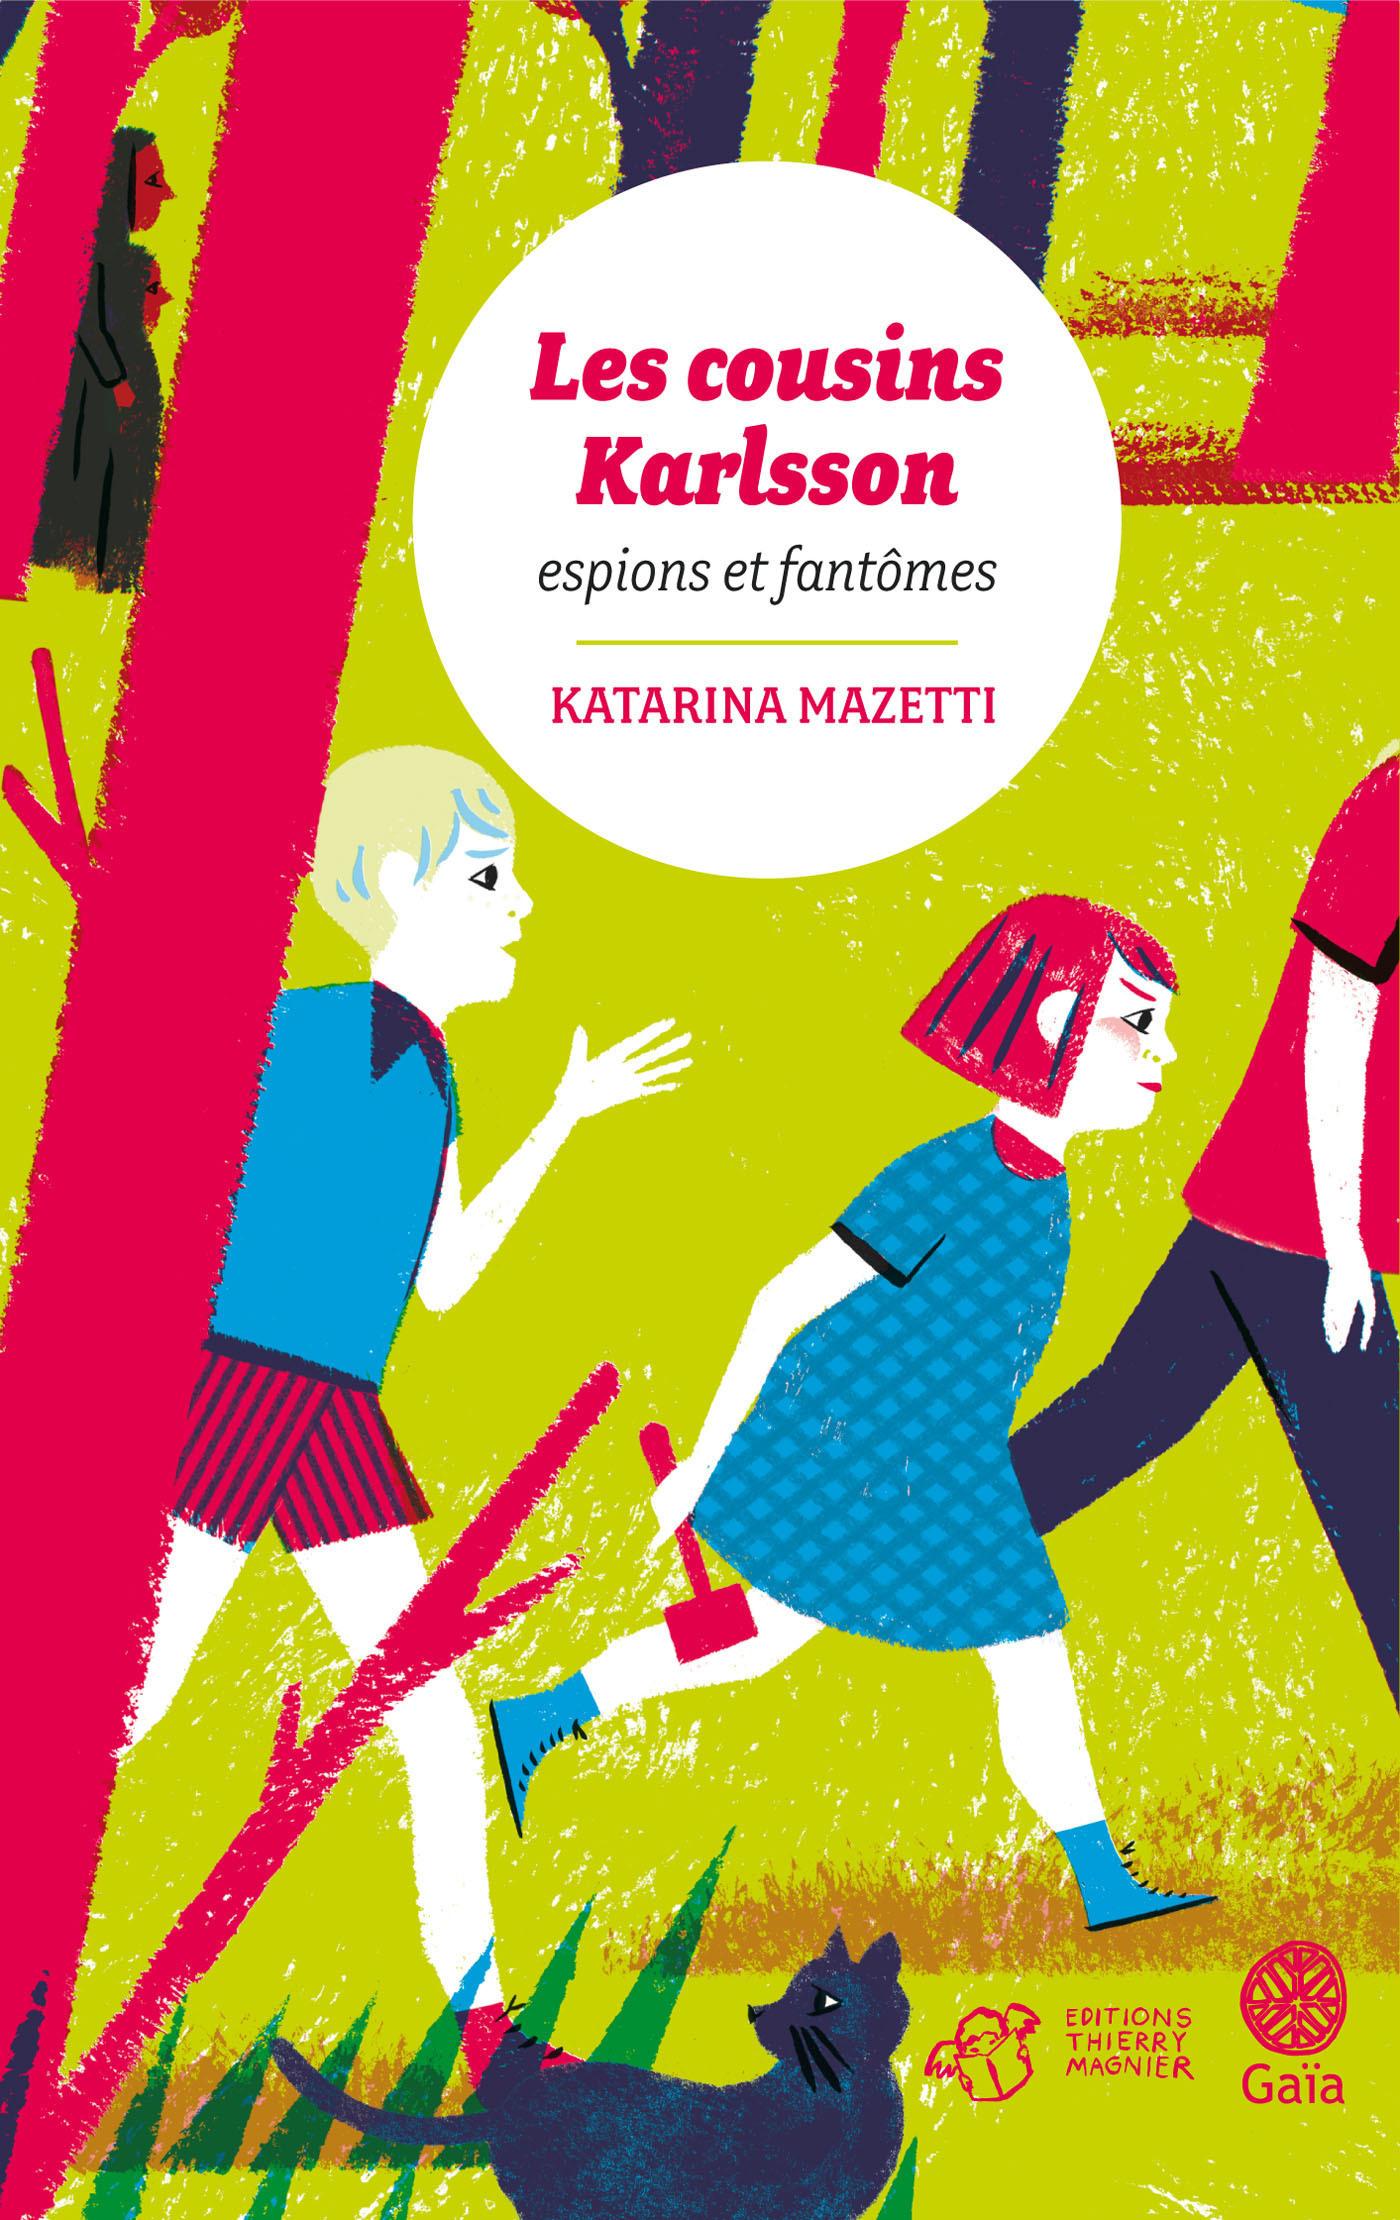 Les cousins Karlsson Tome 1 - Espions et fantômes | Mazetti, Katarina